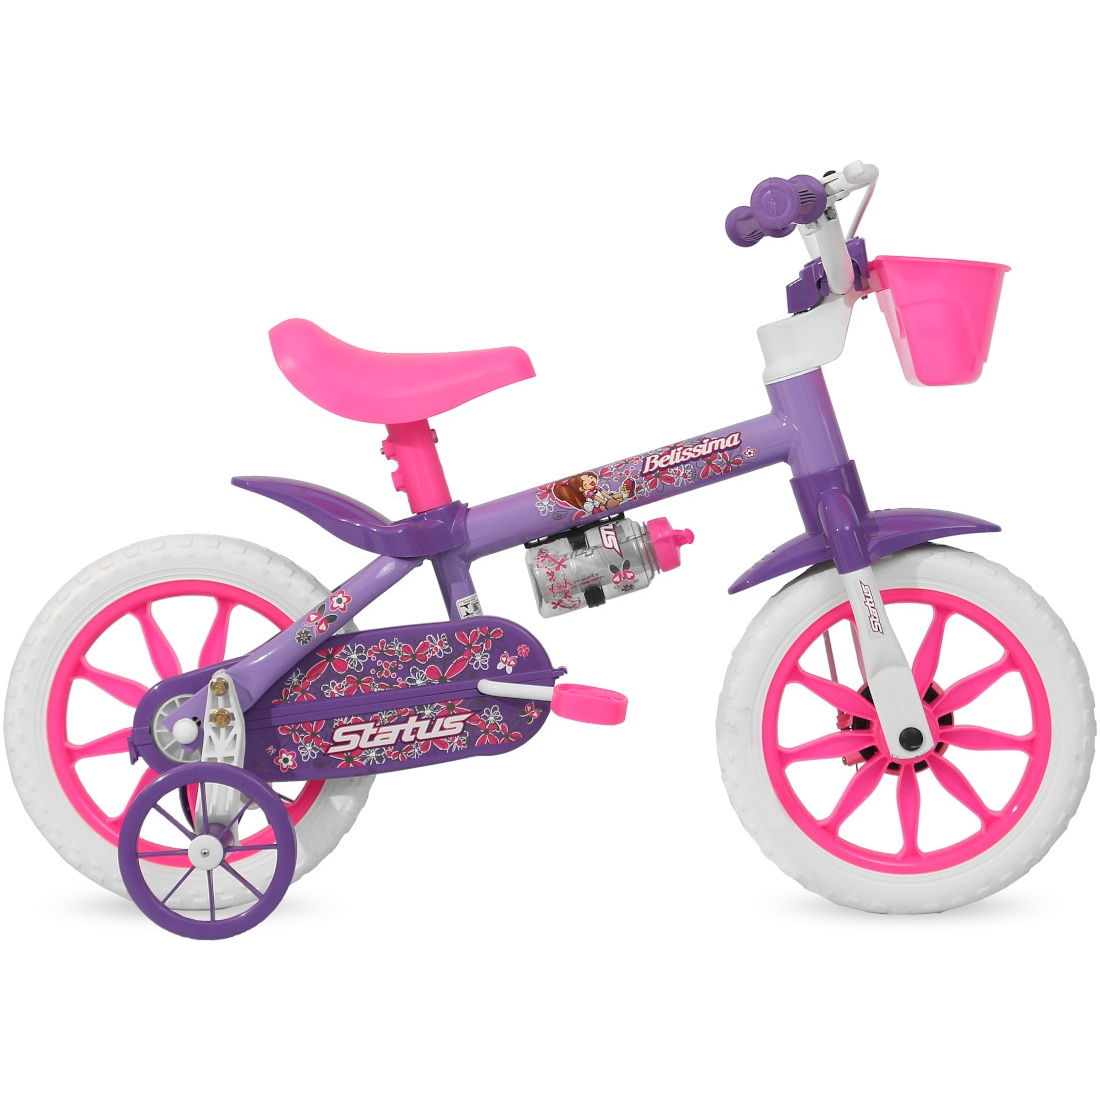 Bicicleta Aro 12 Infantil Feminina Belíssima Free Action